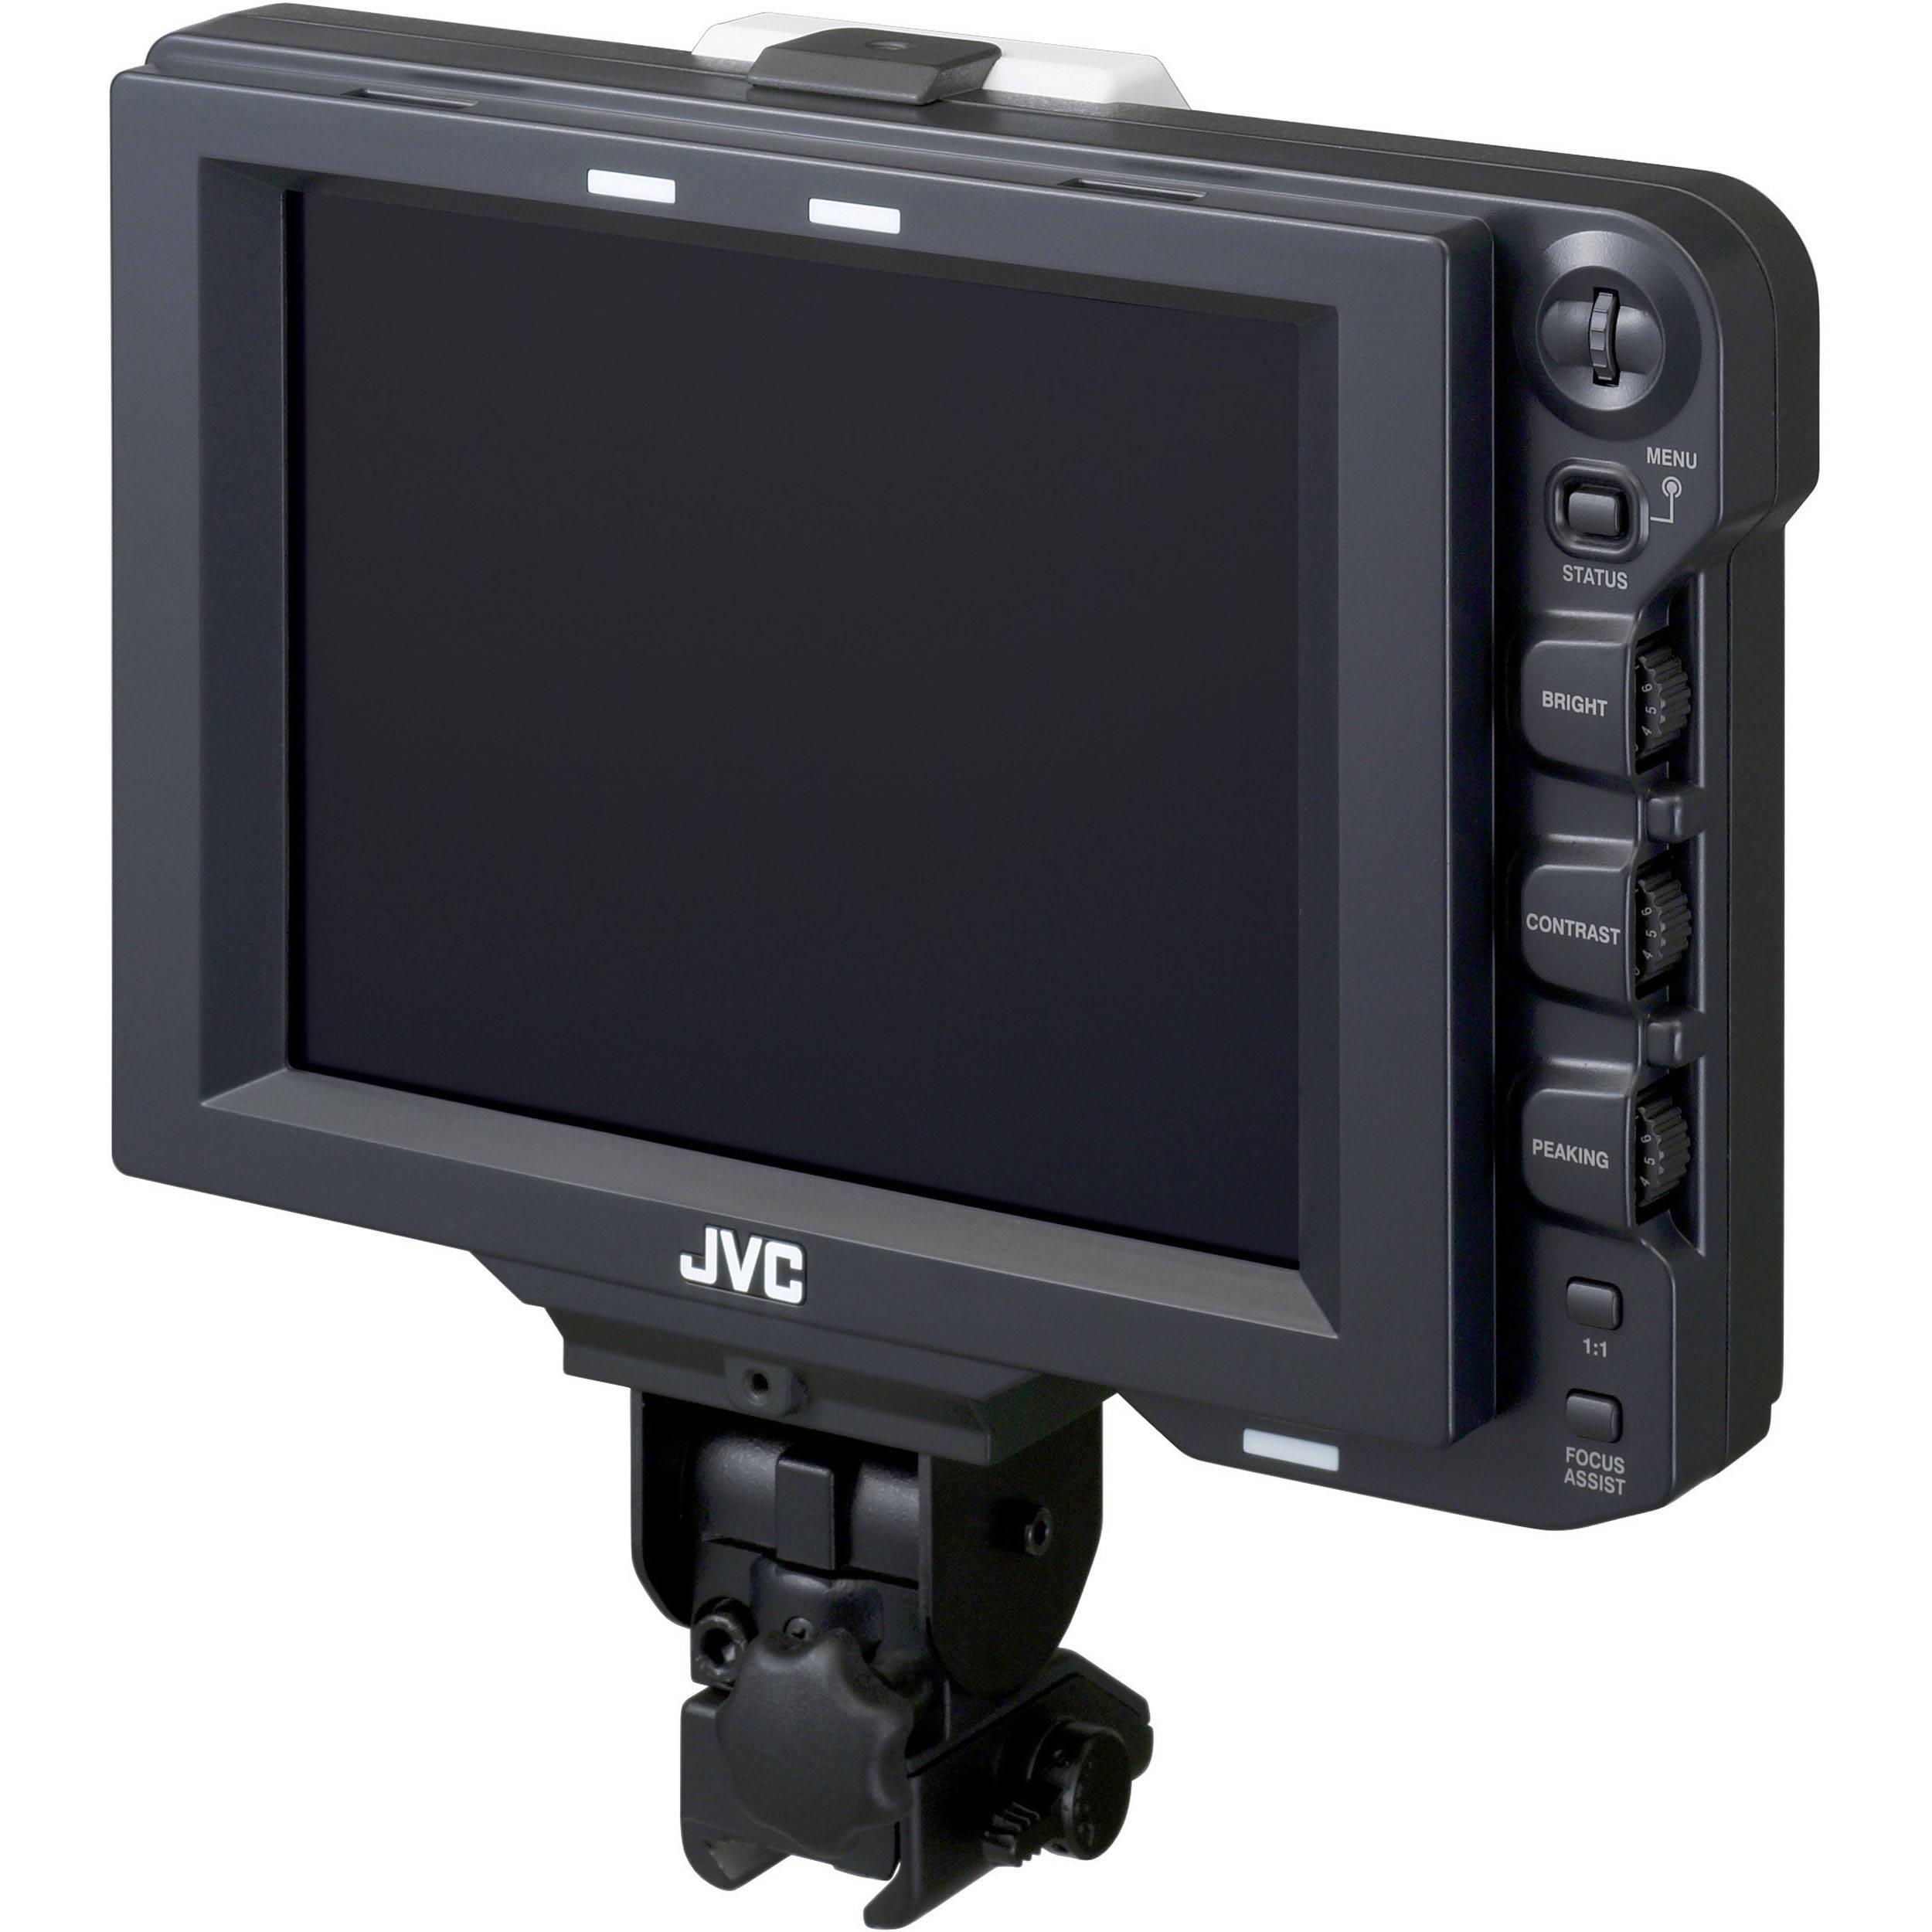 8.4-in HD/SD STUDIO VIEWFINDER